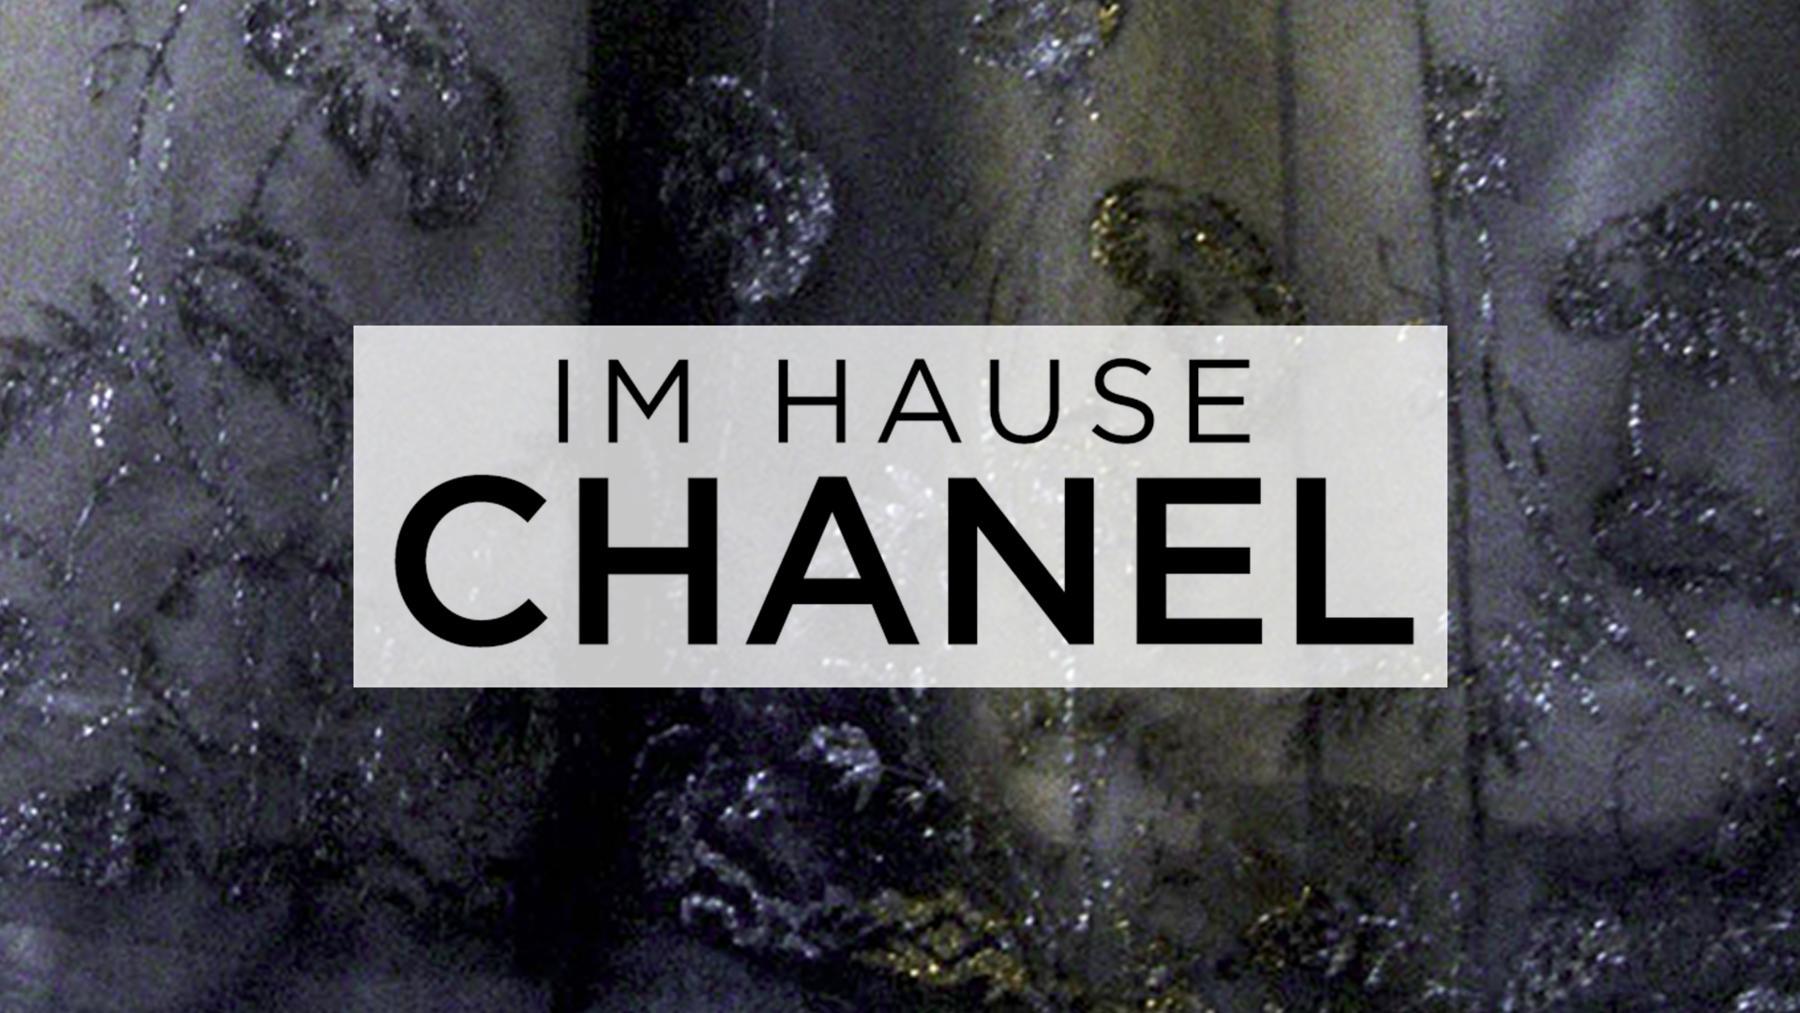 Im Hause Chanel